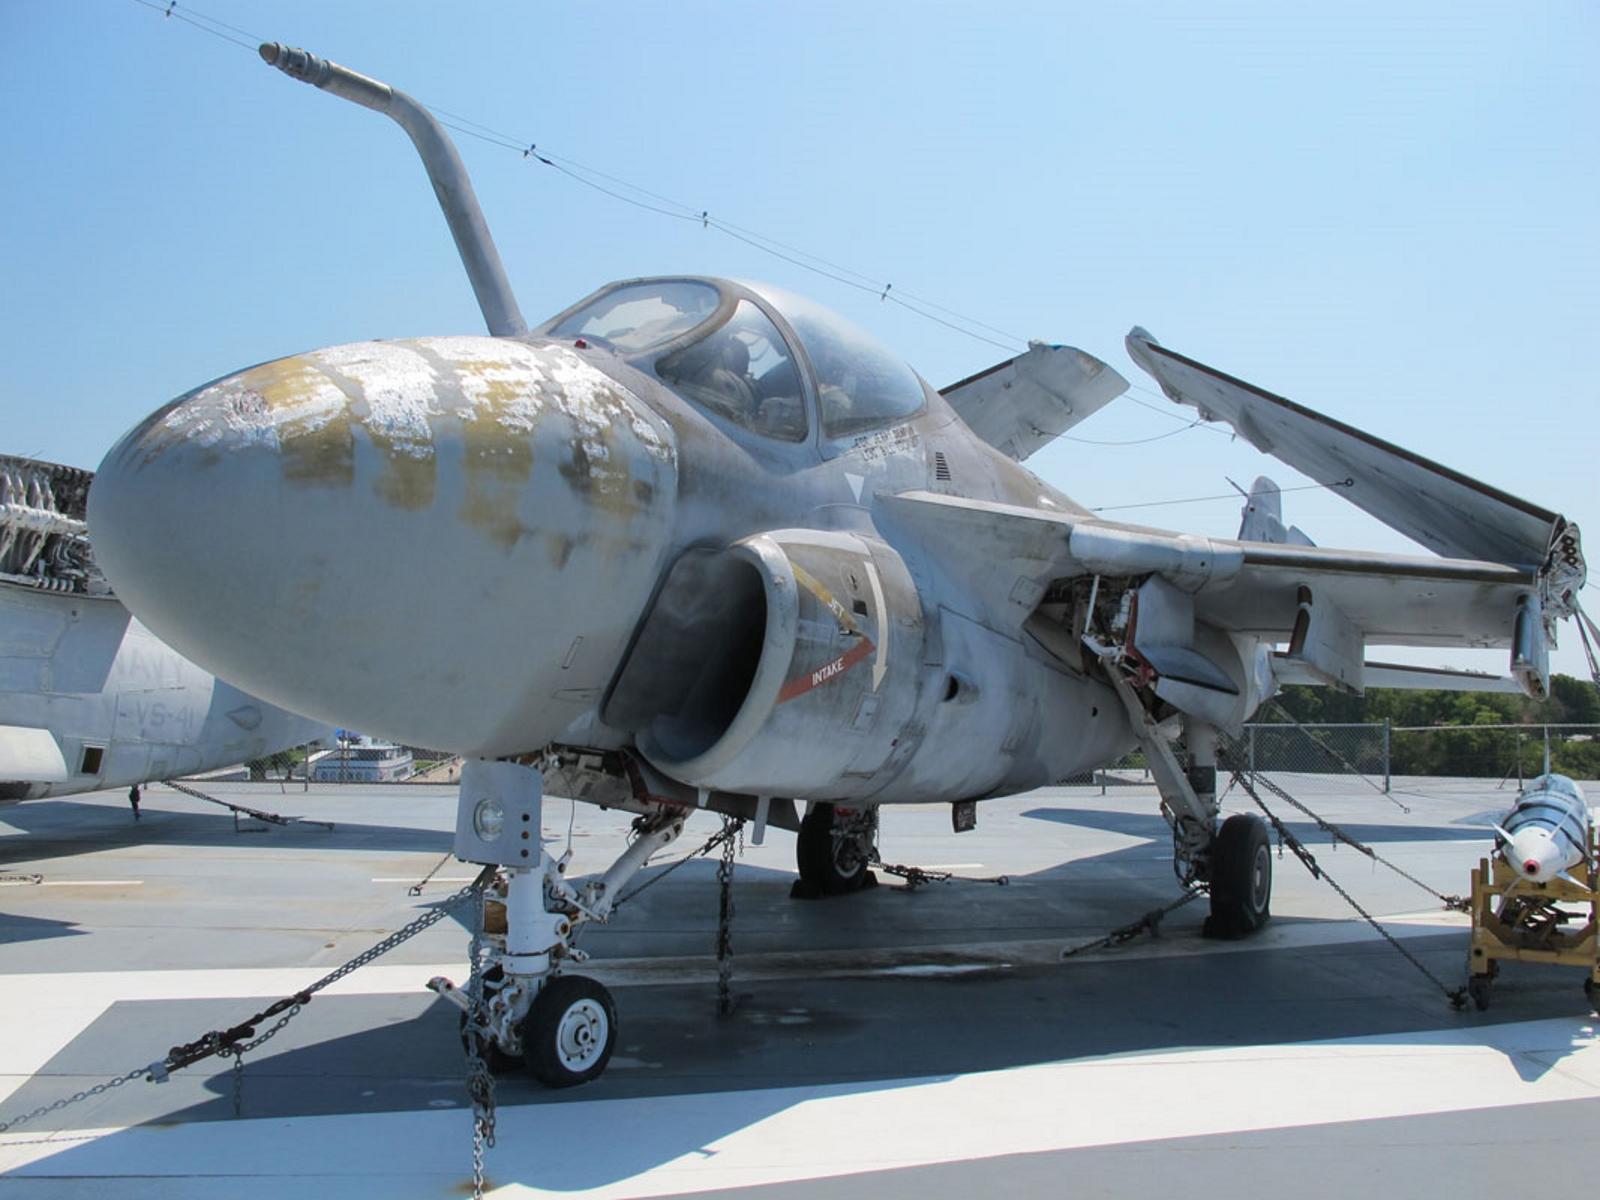 Grumman A-6A Intruder - Photos - English